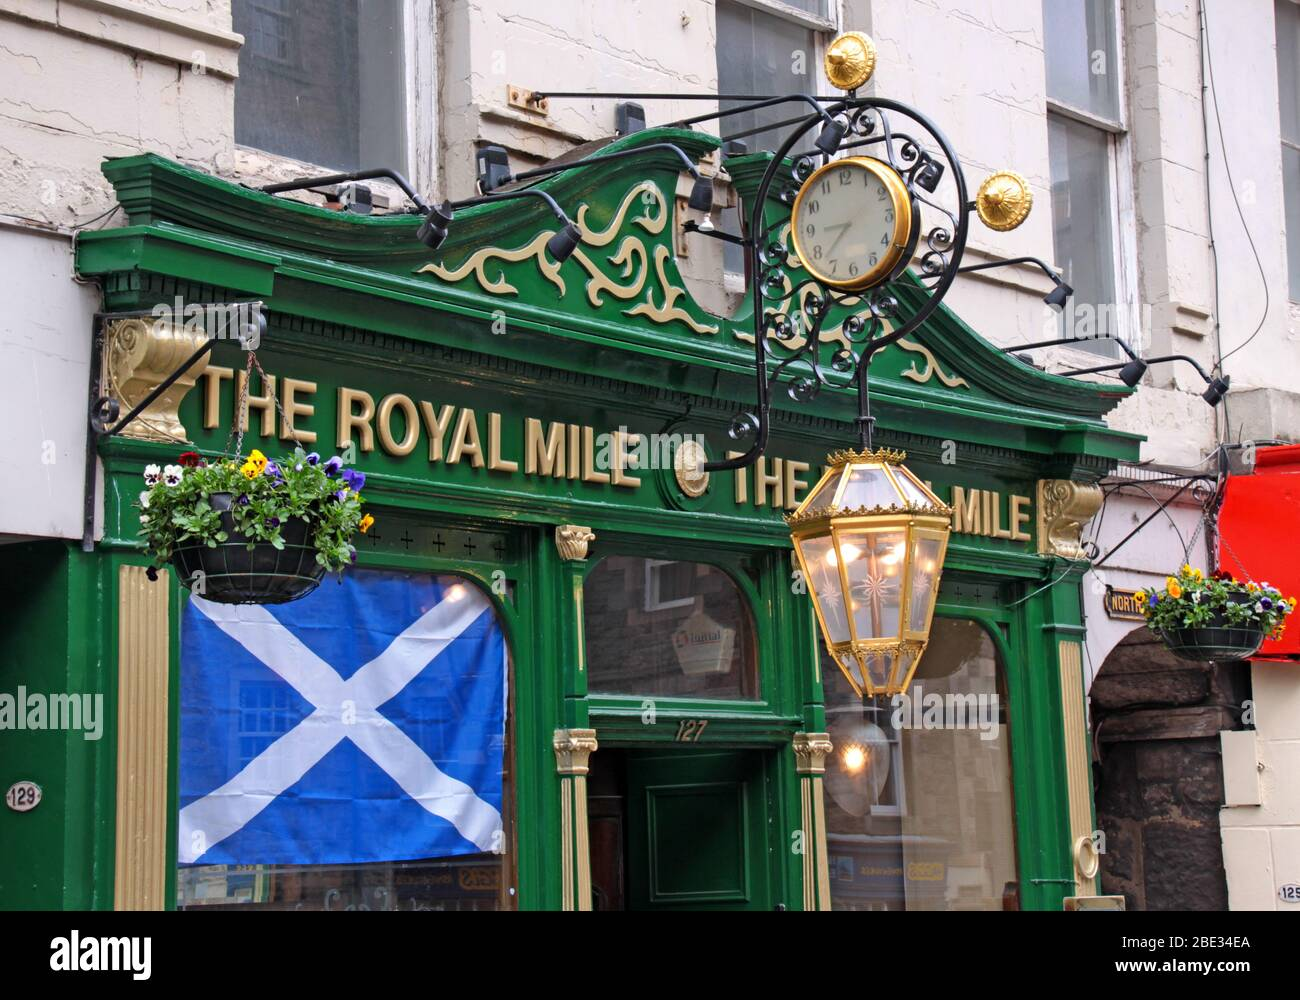 The Royal Mile, Edinburgh , Scotland, UK Stock Photo